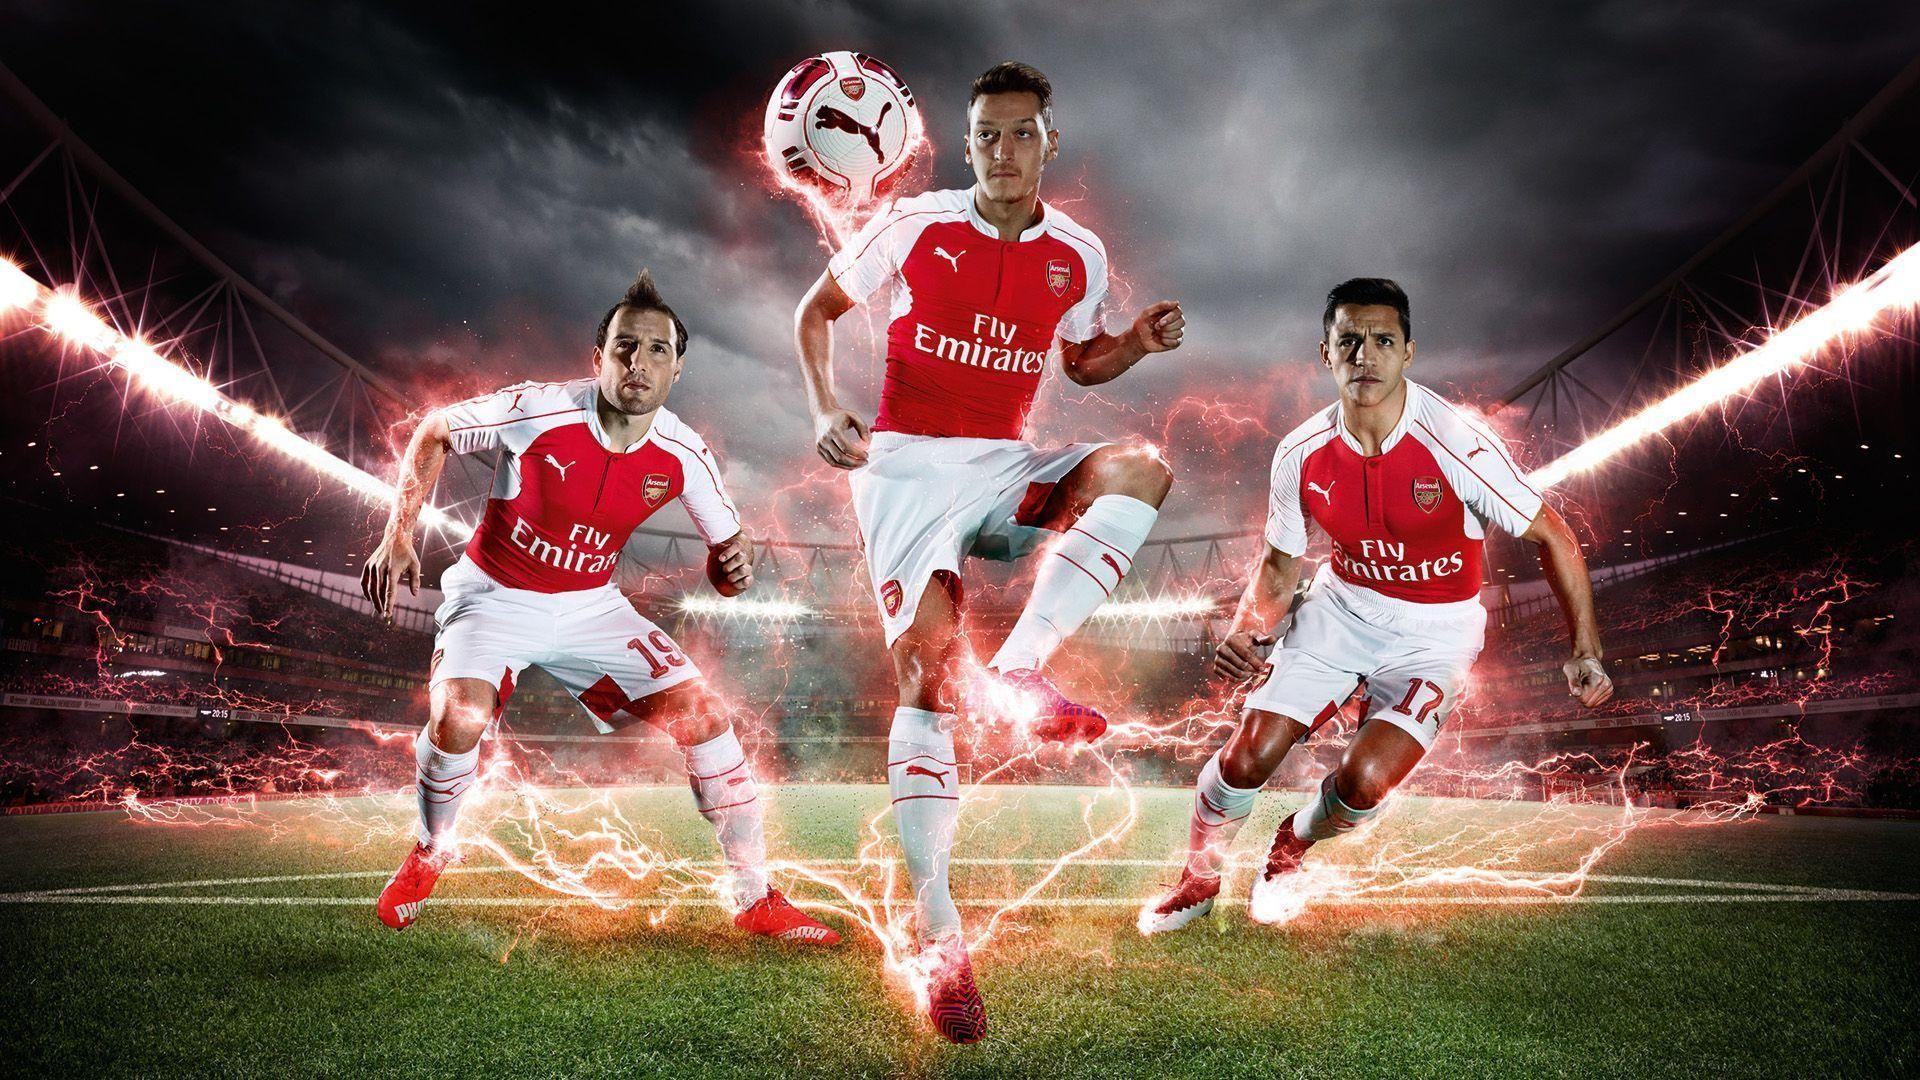 Arsenal Wallpaper 2018 (86+ images)